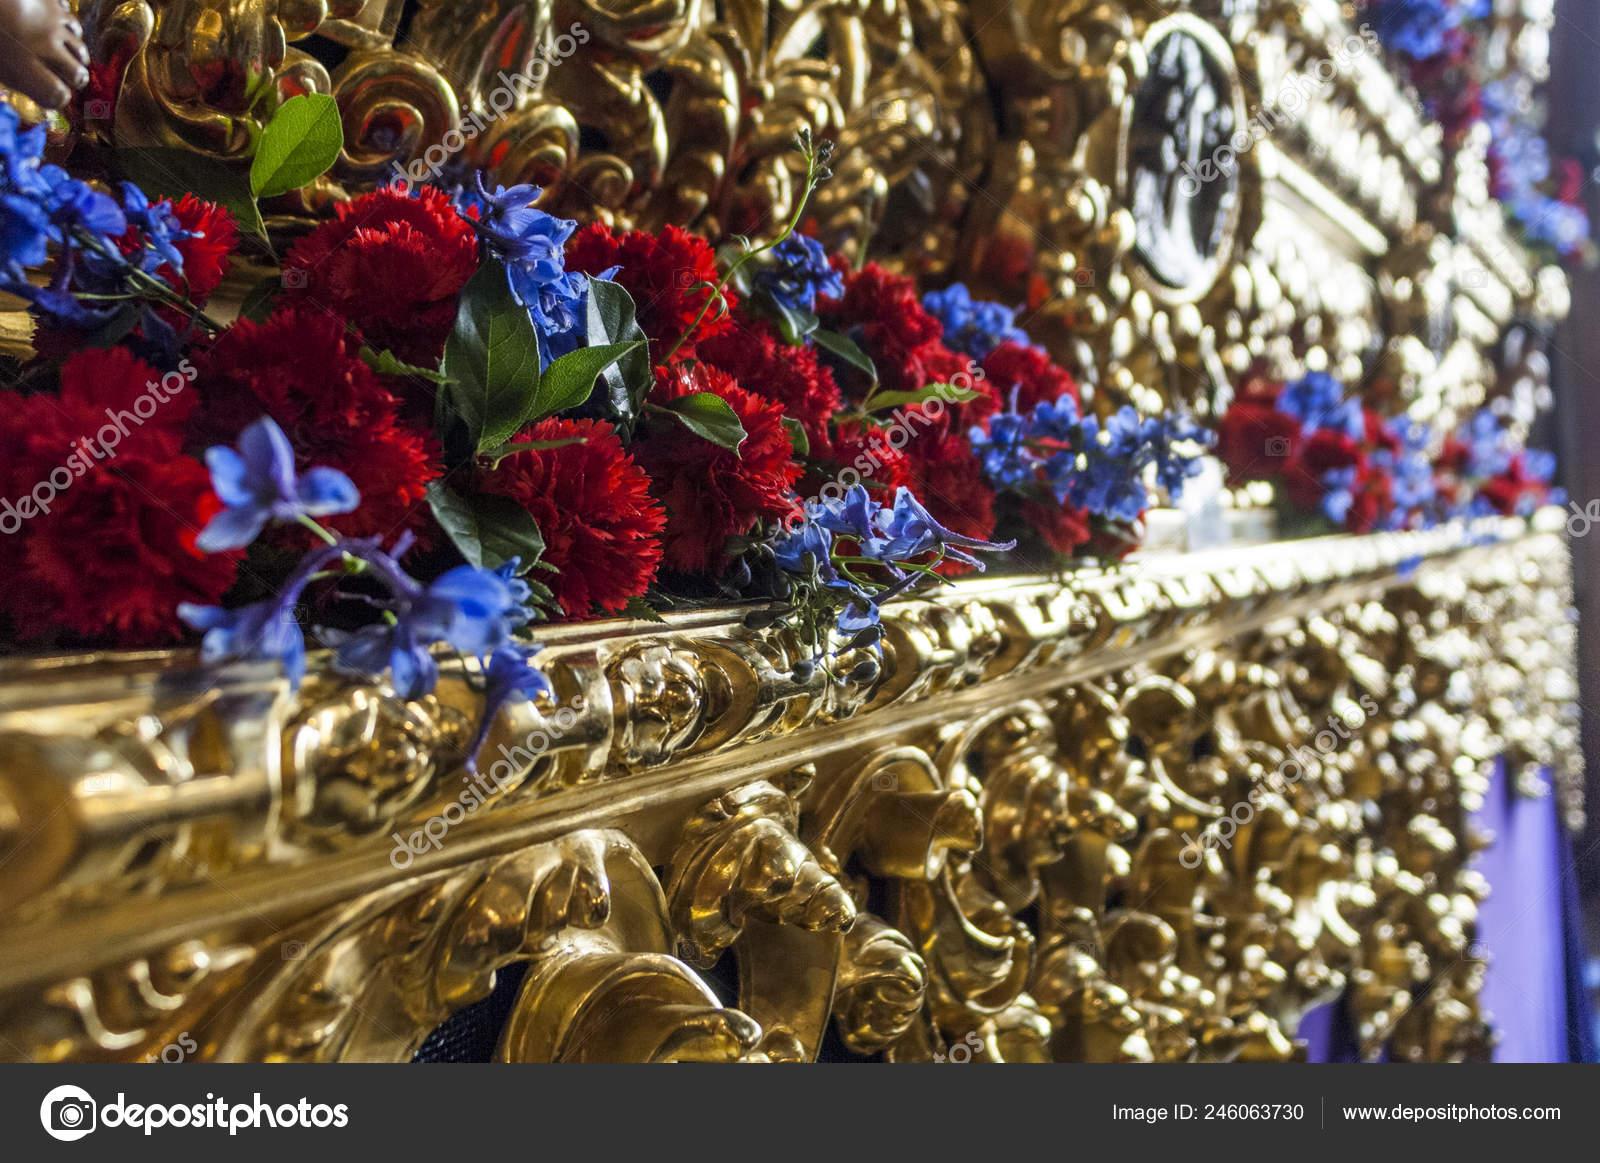 Detalle Talla Madera Decoración Floral Carroza Del Cristo